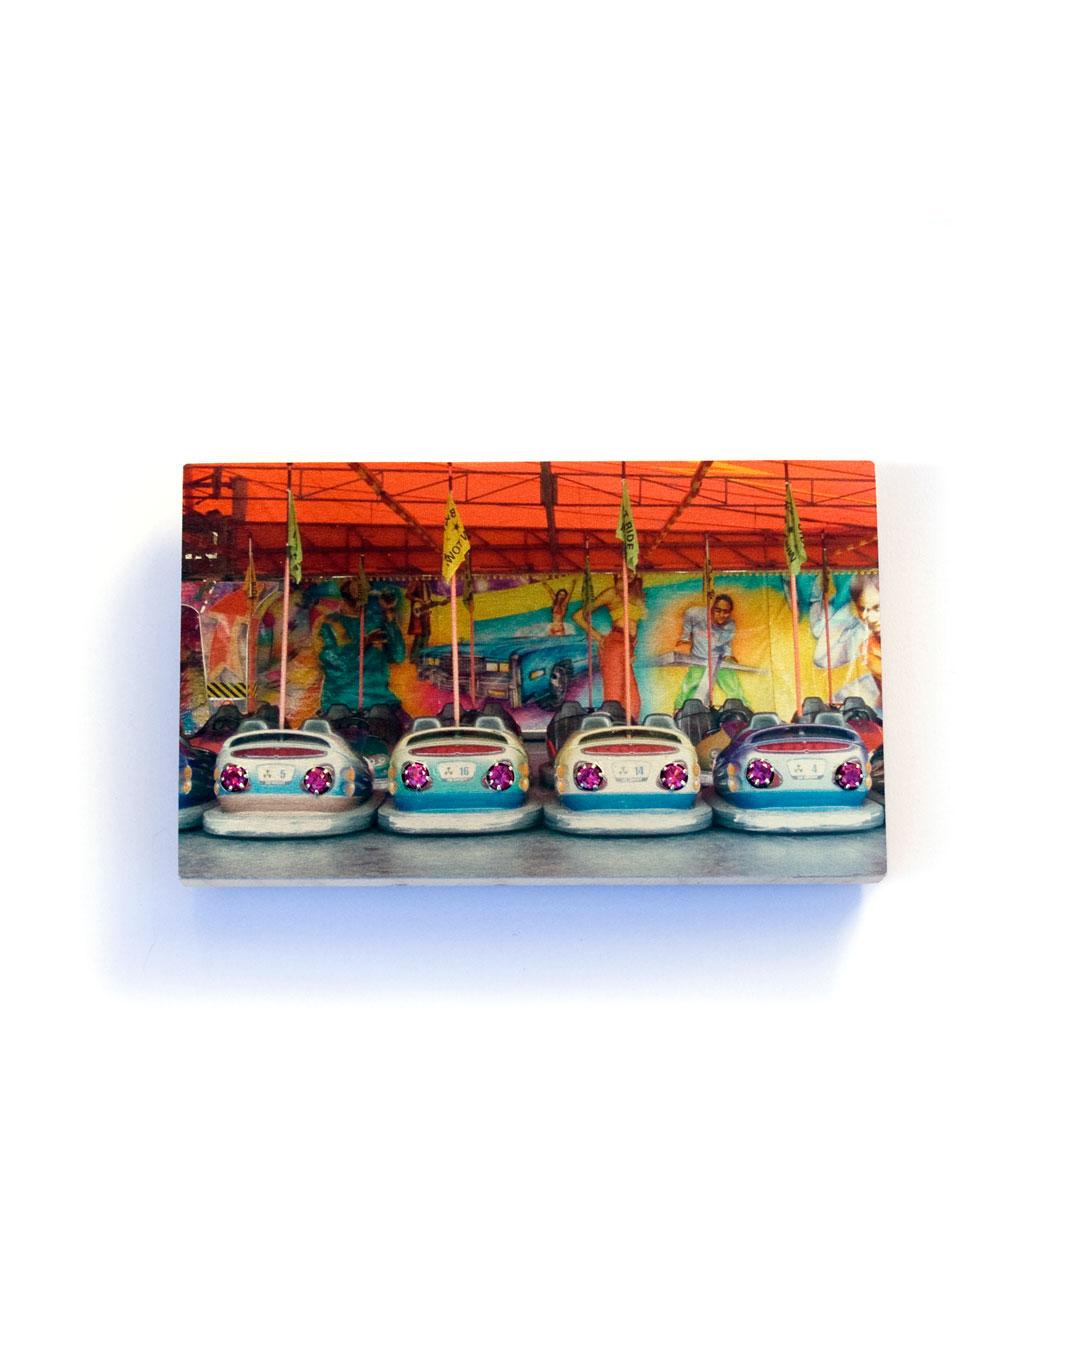 Herman Hermsen, Carnival Cars, 2015, brooch; print on aluminium, wood, zirconia, 49 x 78 x 12 mm, €300